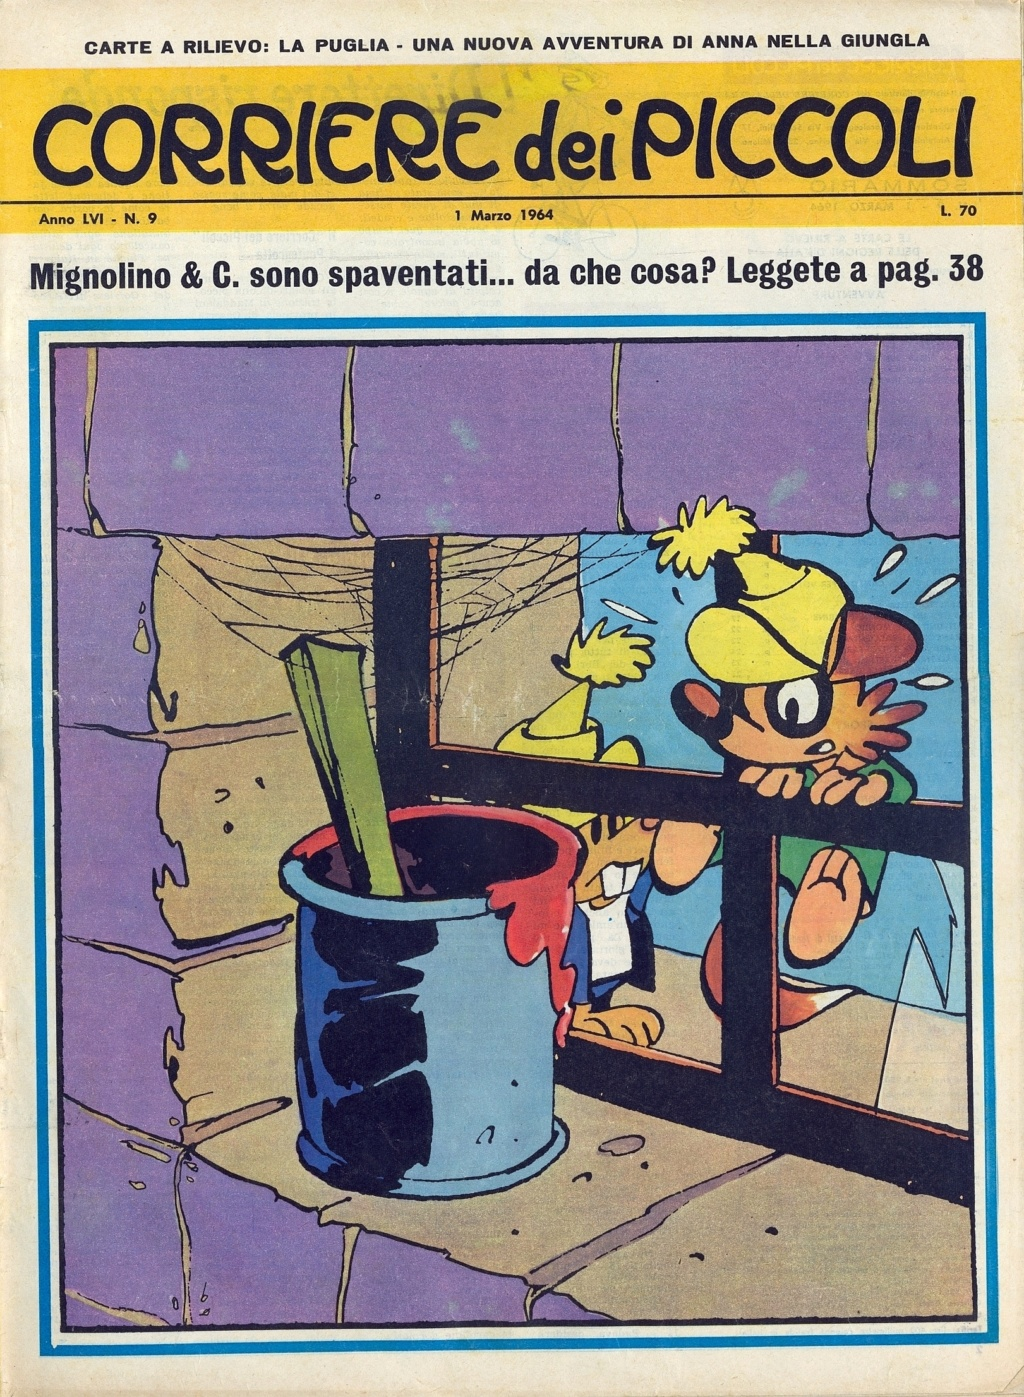 Le cadre merveilleux de Raymond Macherot - Page 16 Cdp19611